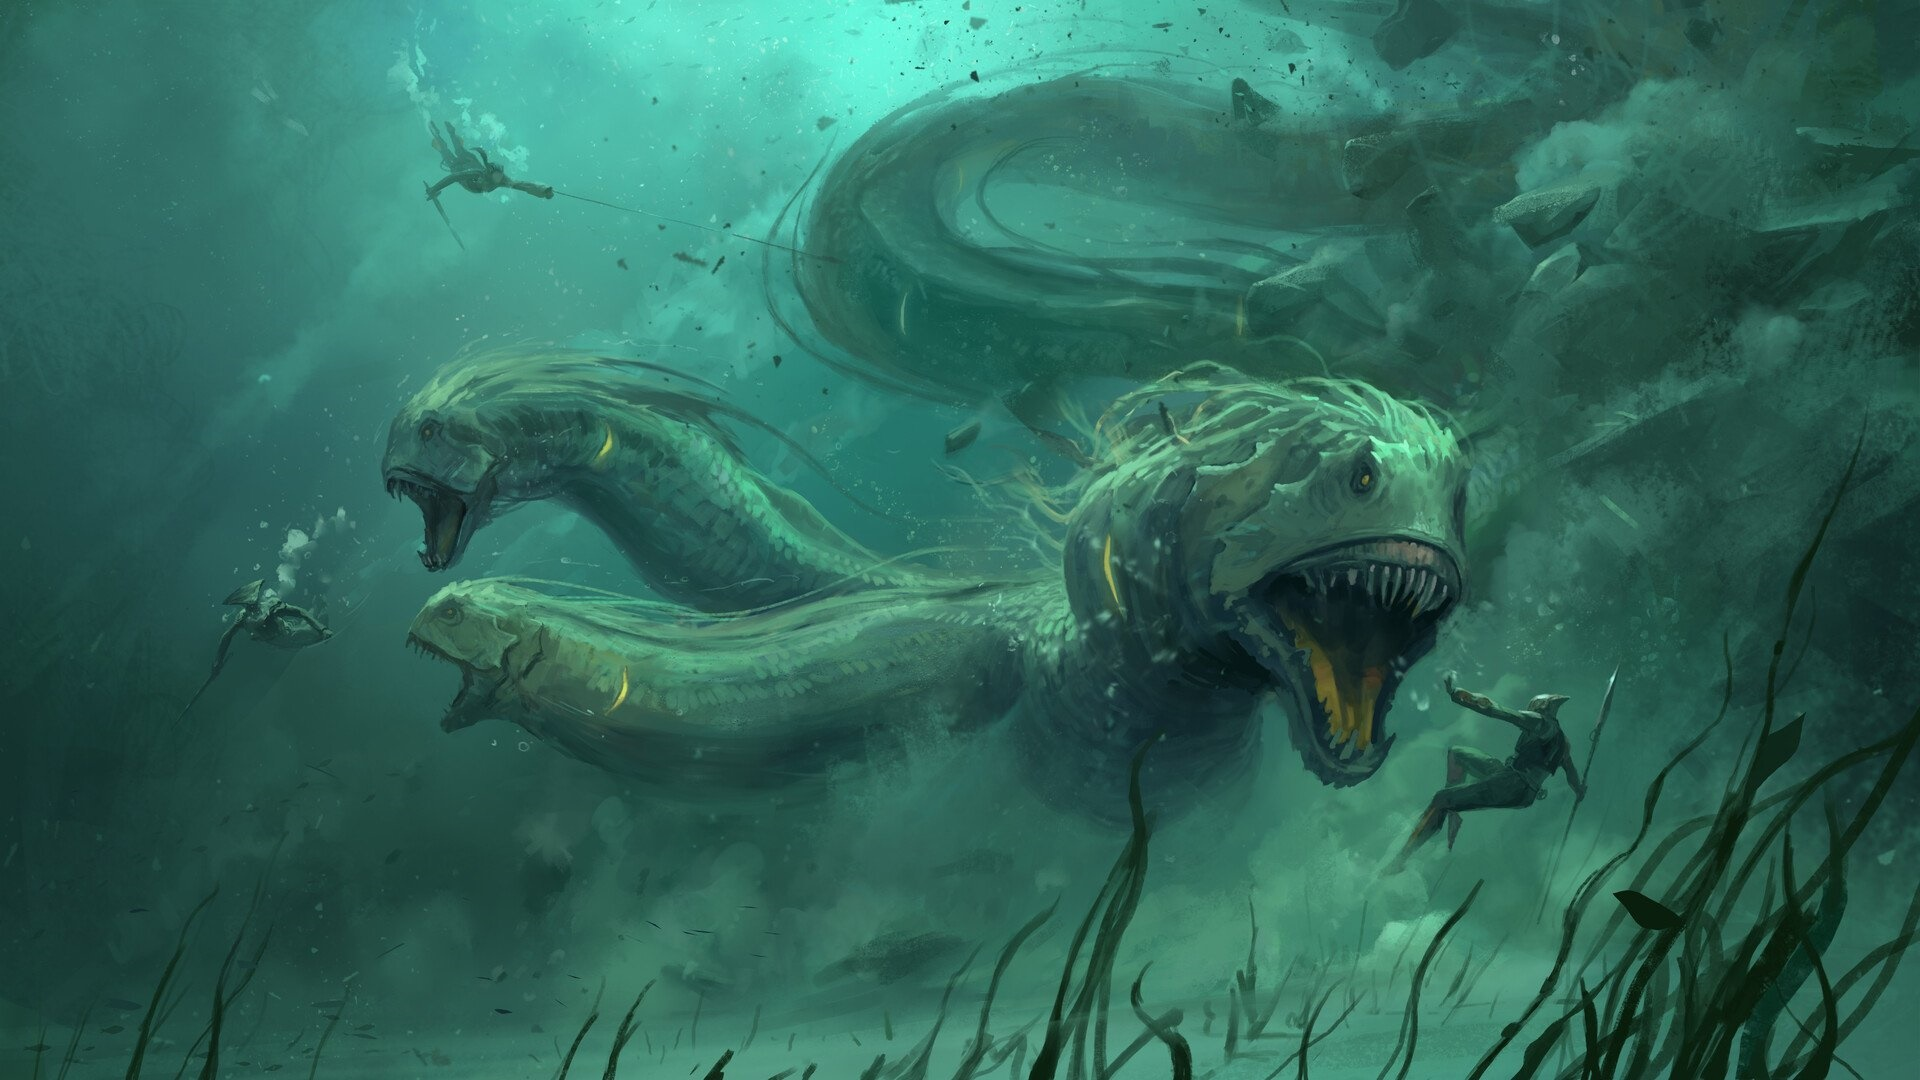 Underwater monster wallpaper